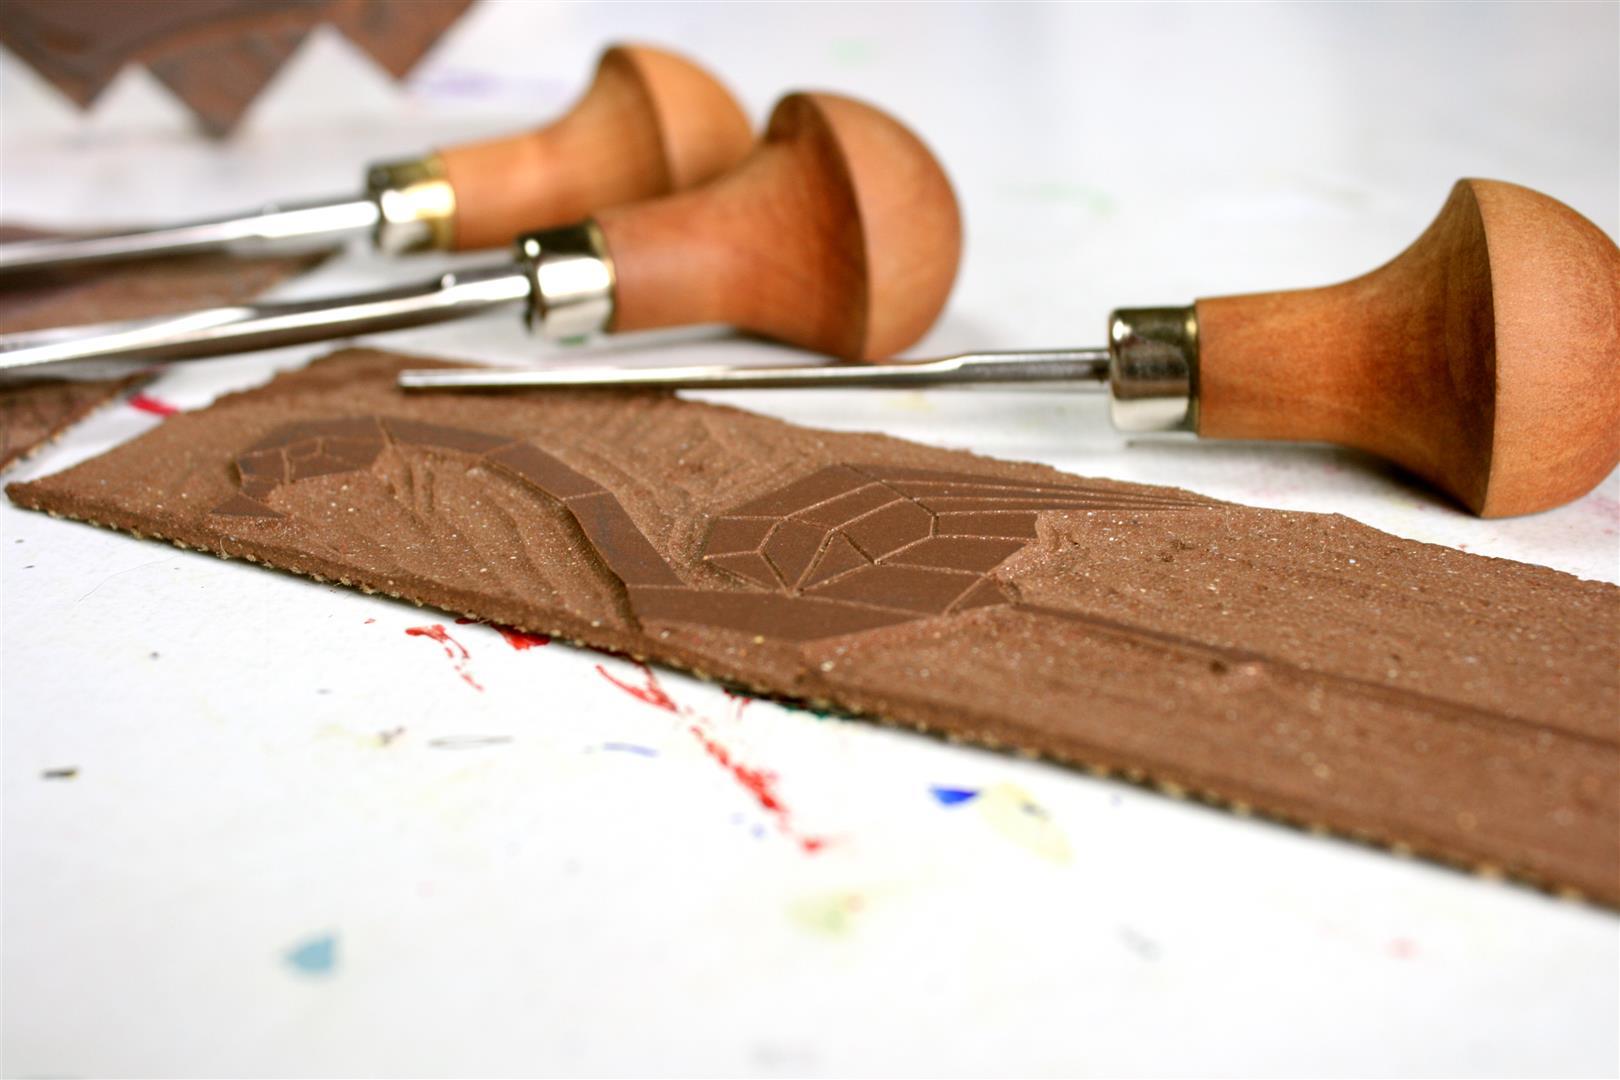 Linolschnitt von Nadeshda Horte